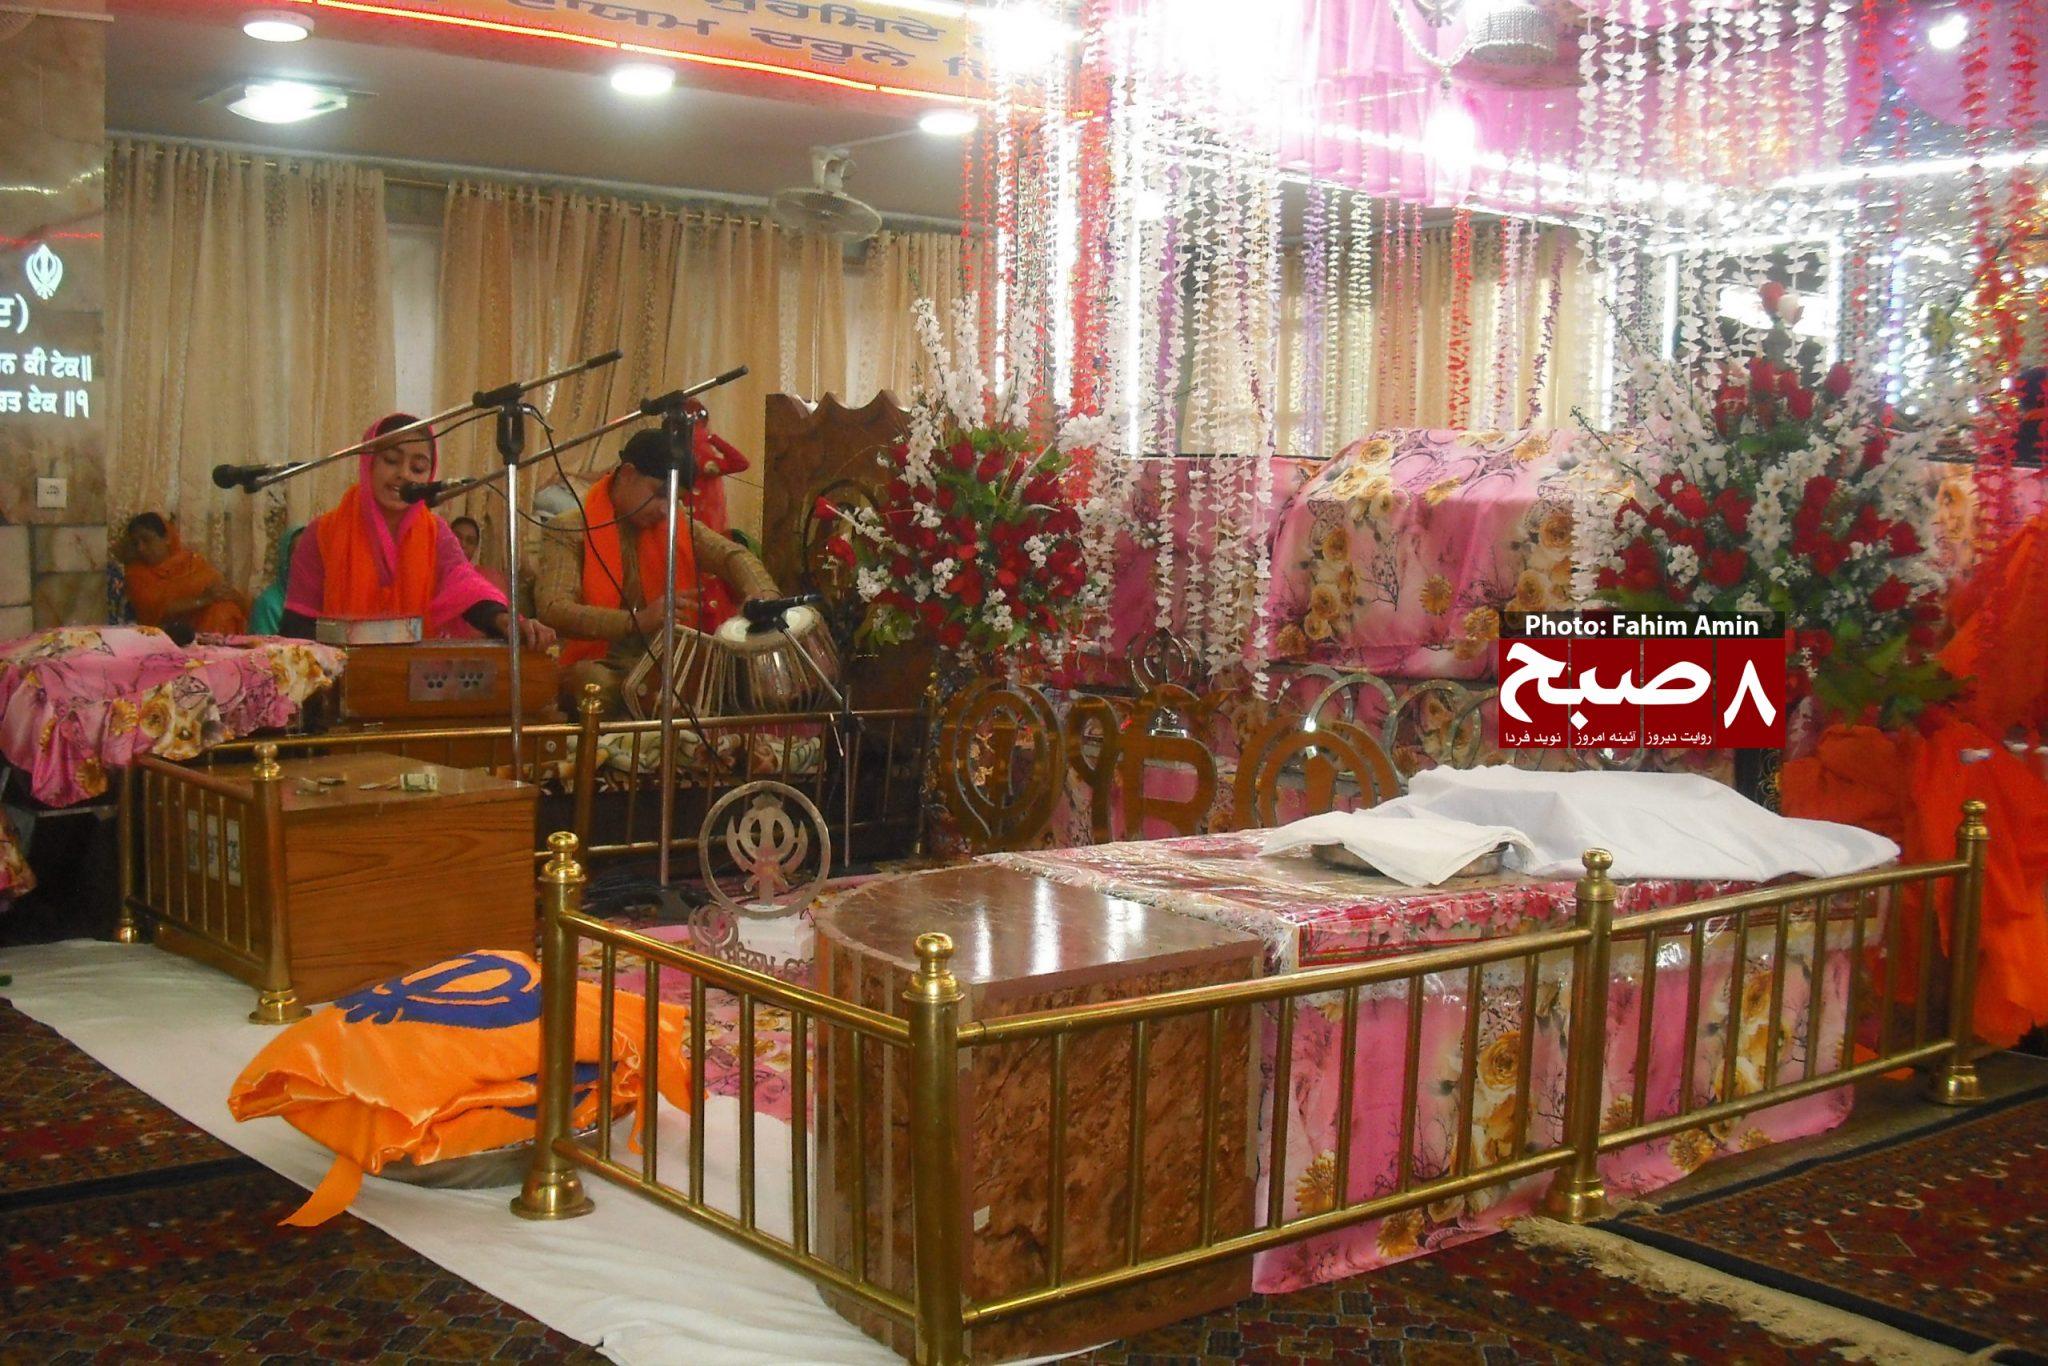 government-allocates-40-million-afghanis-to-rebuild-hindu-shrines